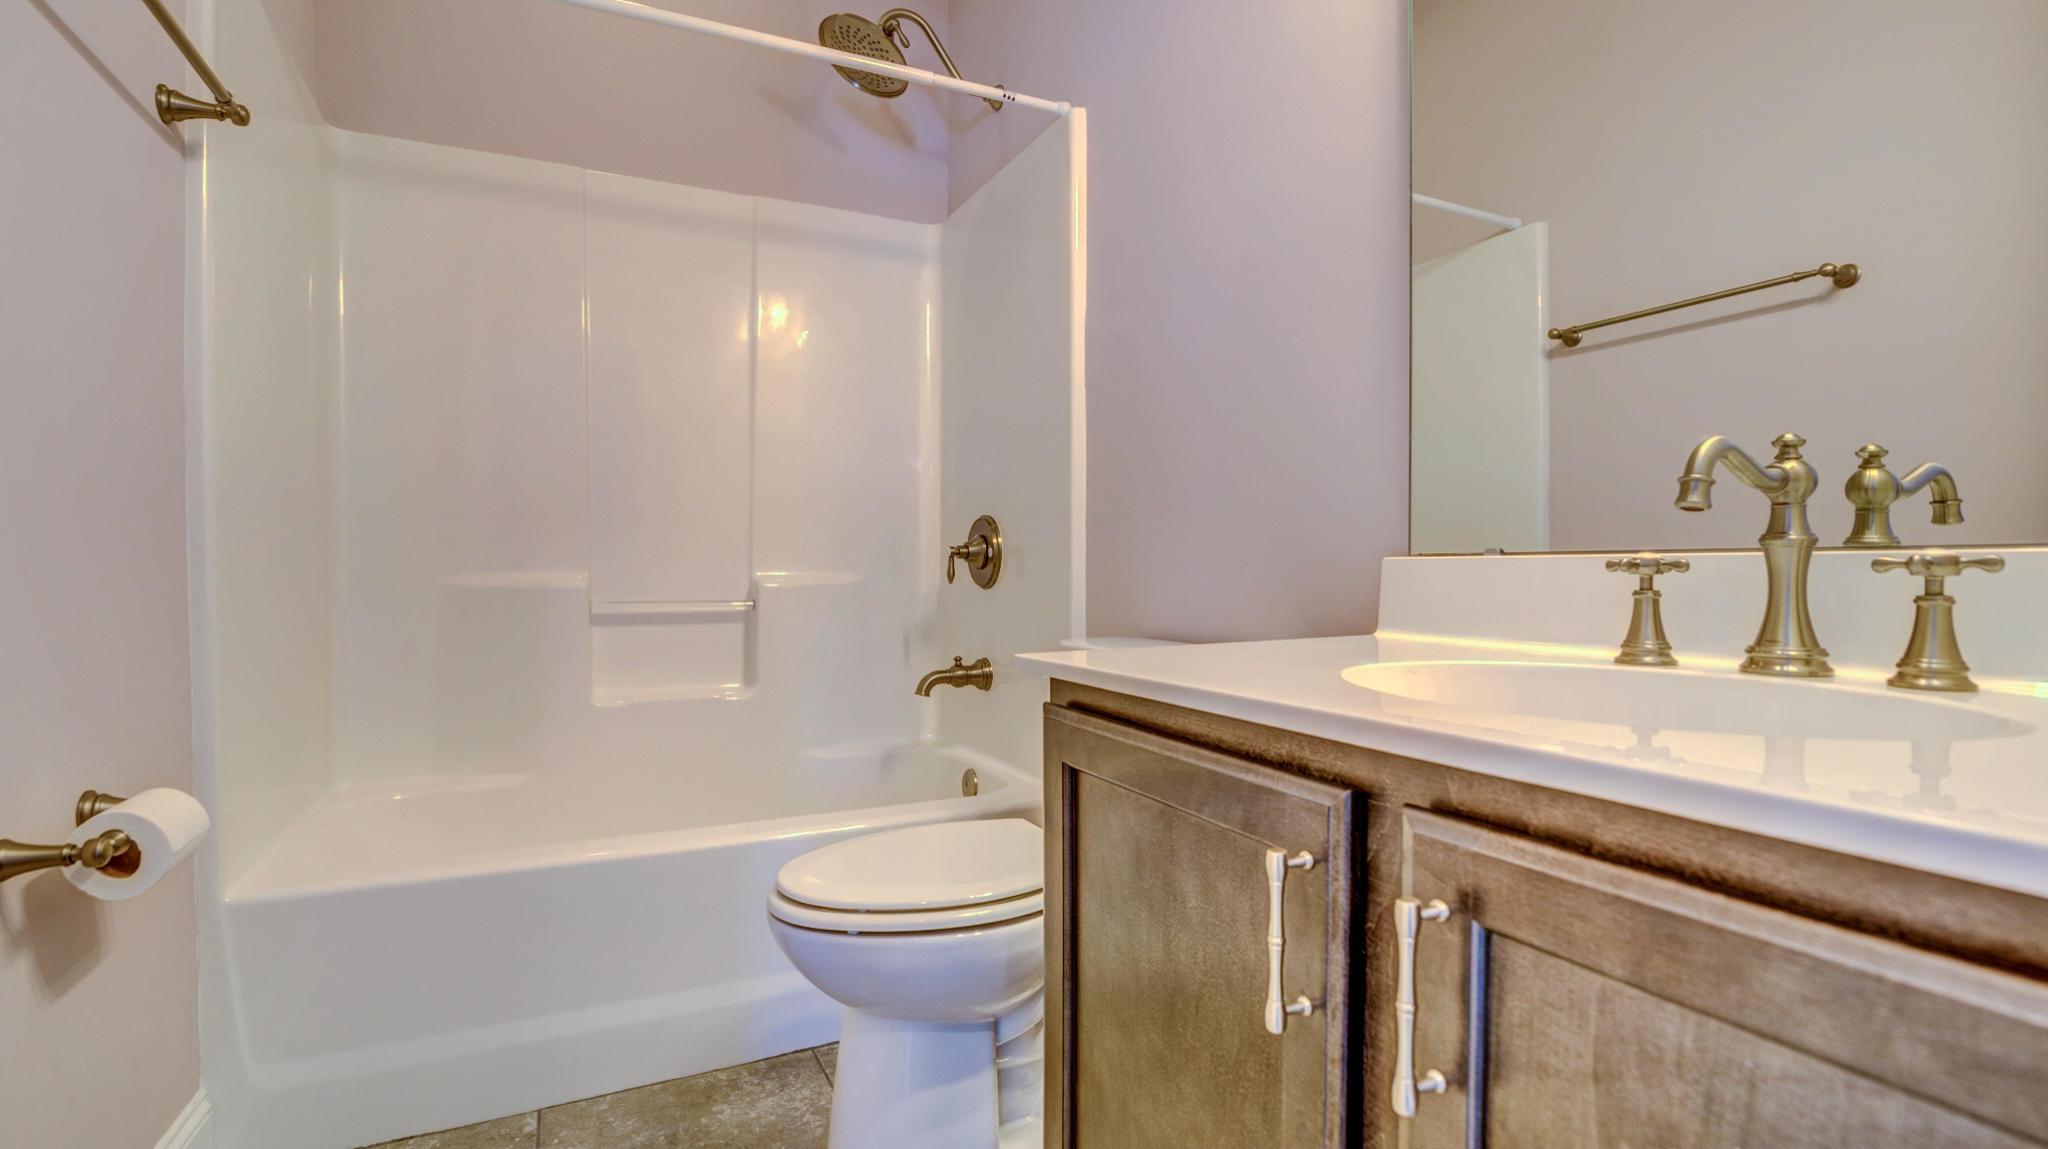 Carolina Park Homes For Sale - 3687 Spindrift, Mount Pleasant, SC - 25